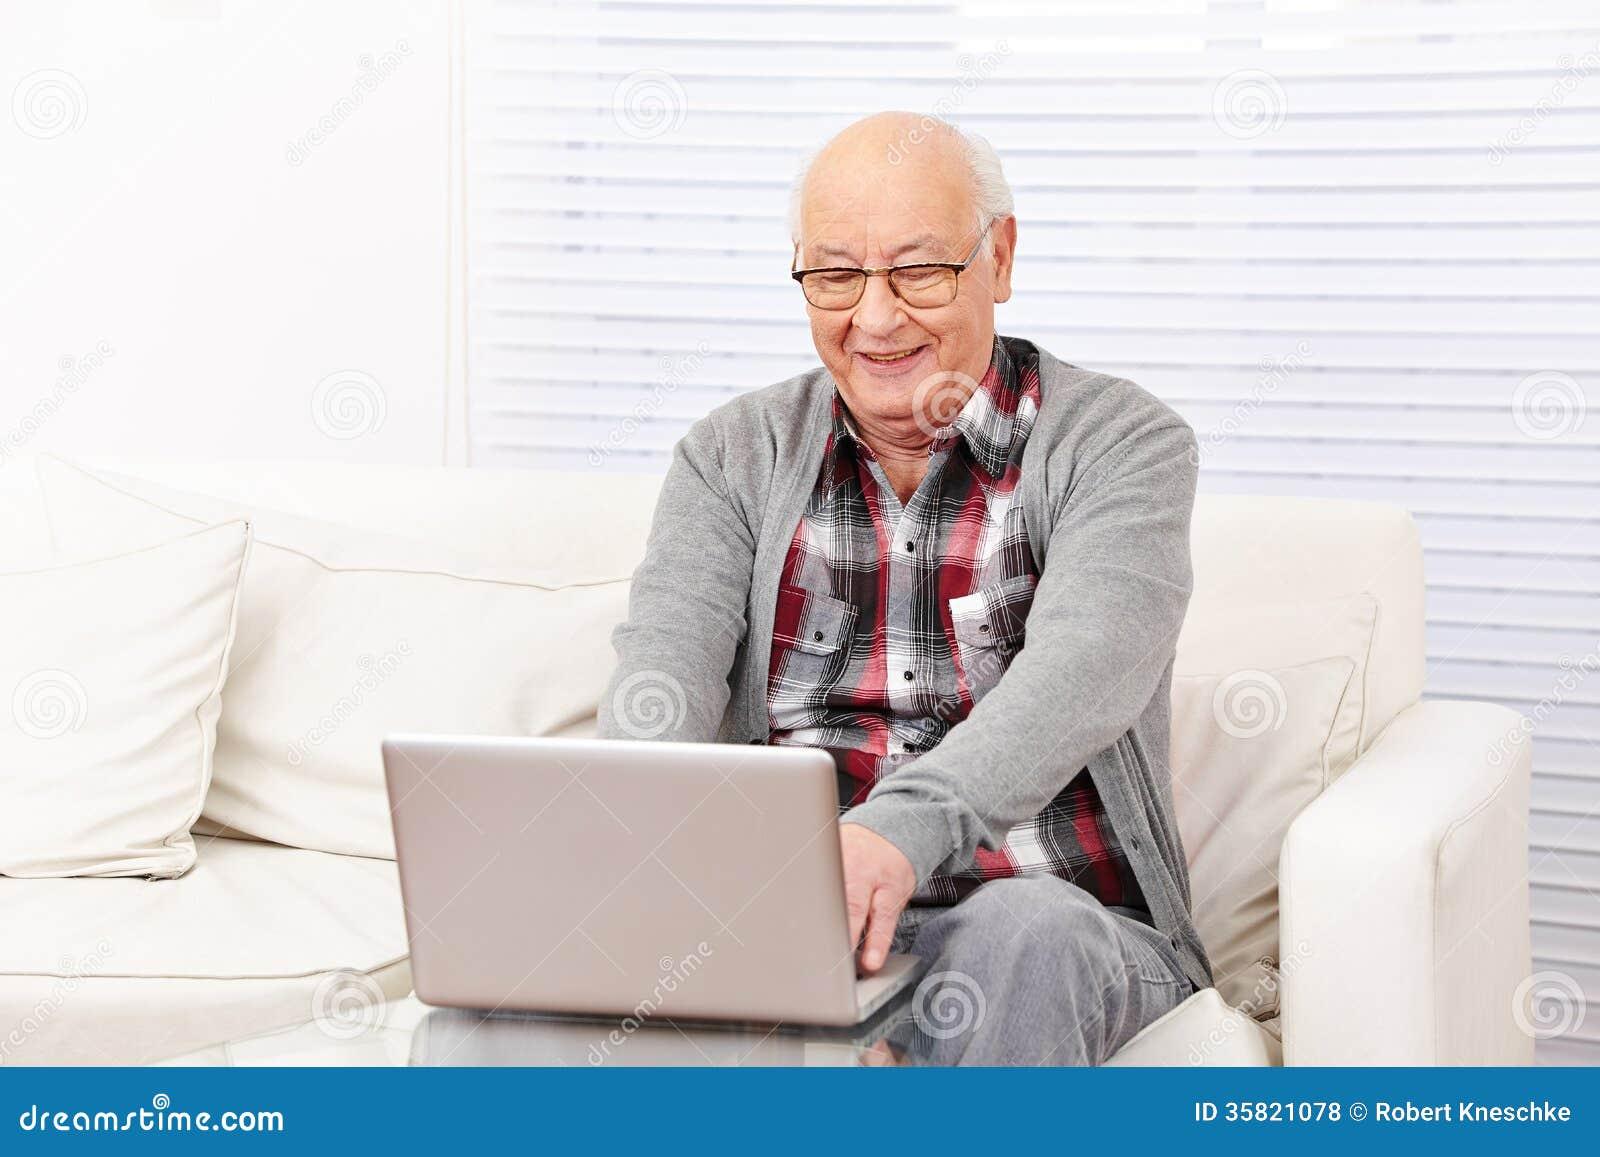 Senior Man With Computer Royalty Free Stock Photos - Image: 35821078